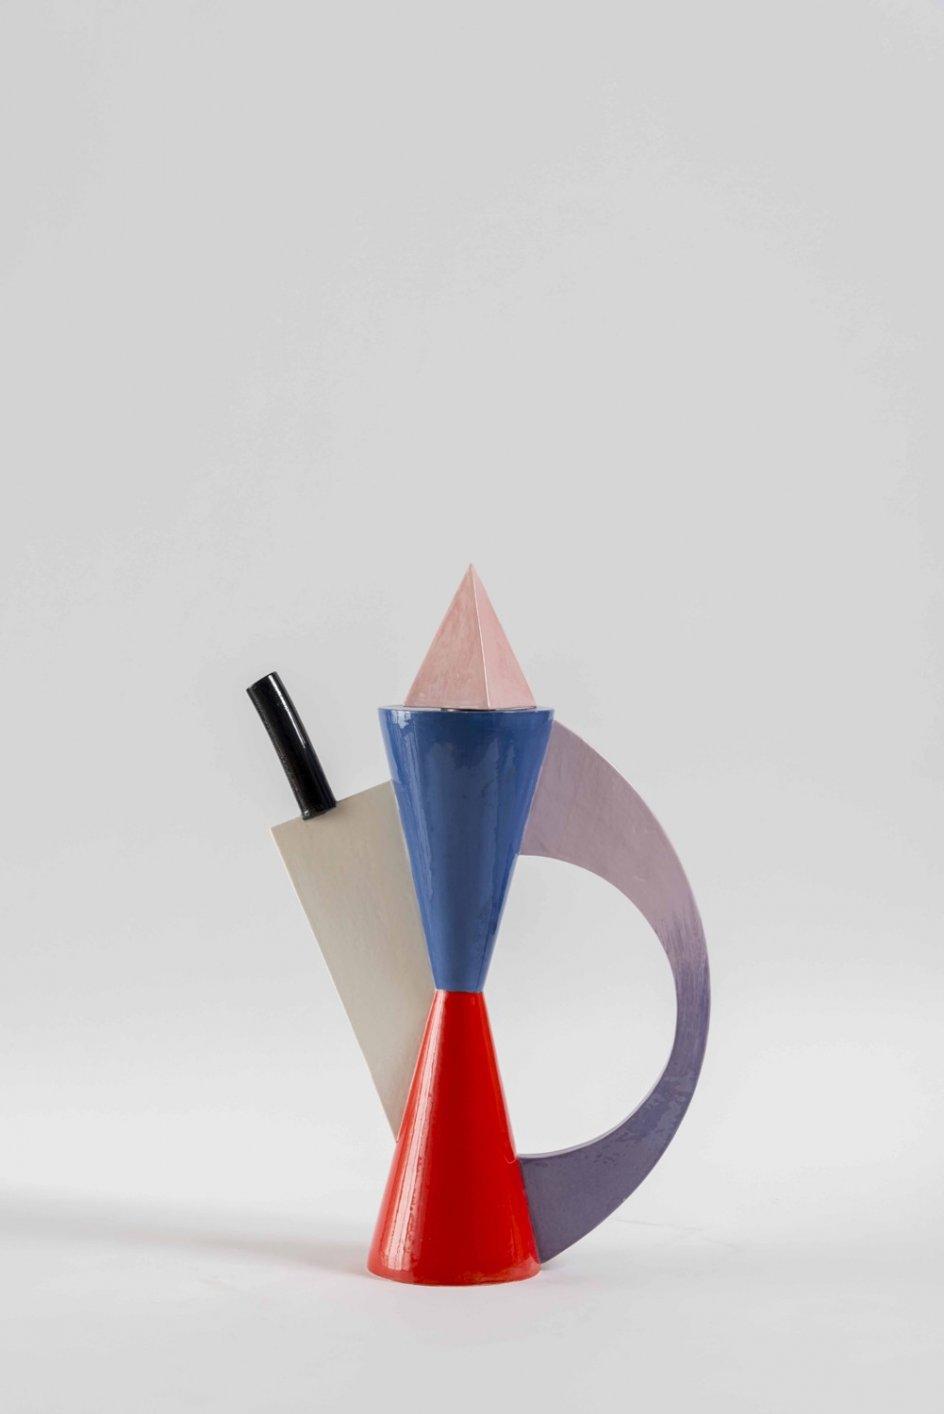 'Hourglass Teapot', 1984. 'Tetera reloj de arena', pieza de cerámica creada por Shire en 1984